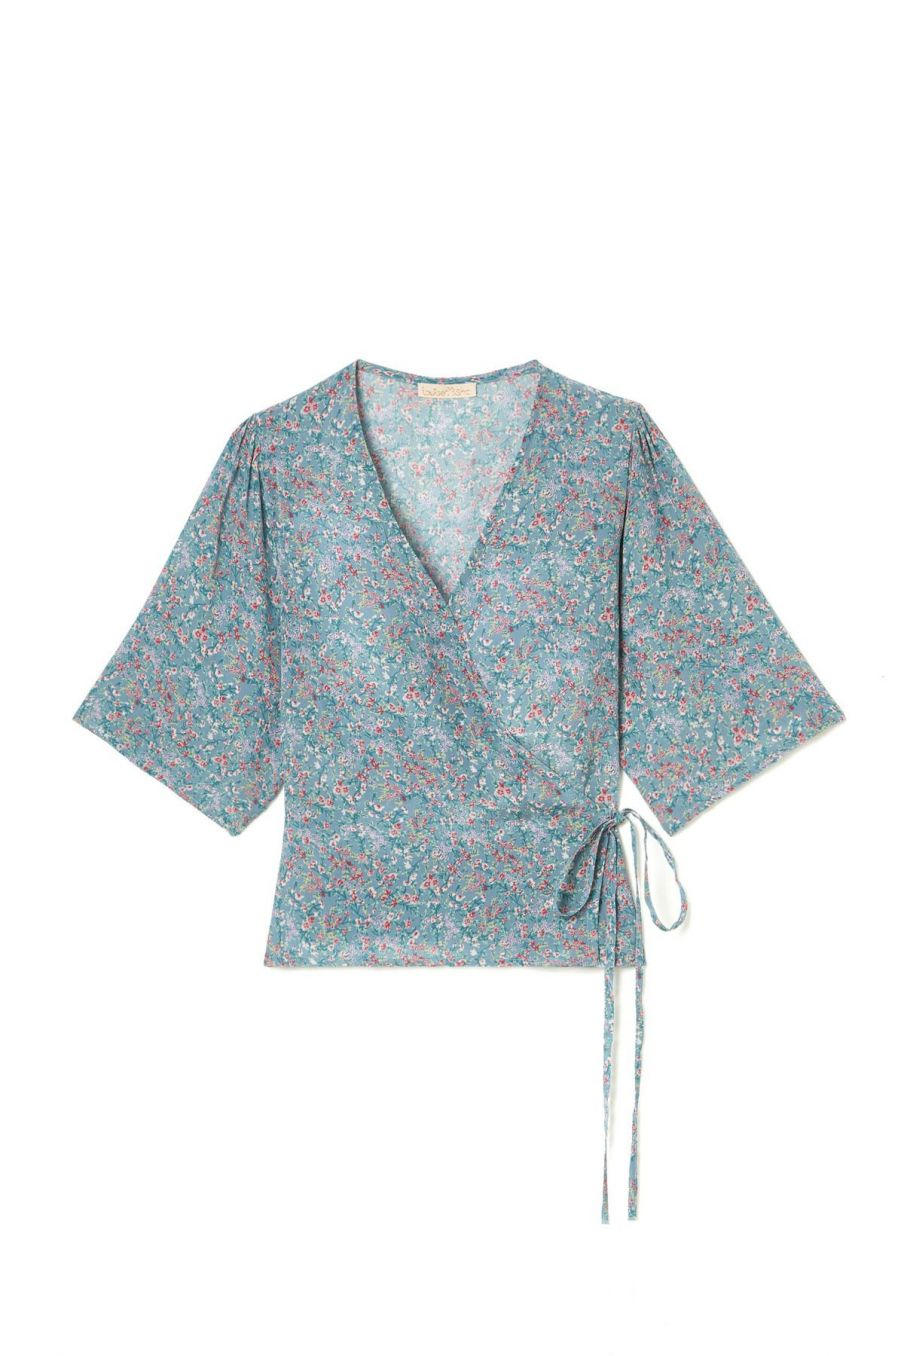 boheme chic vintage blouse femme roseville storm spring flowers